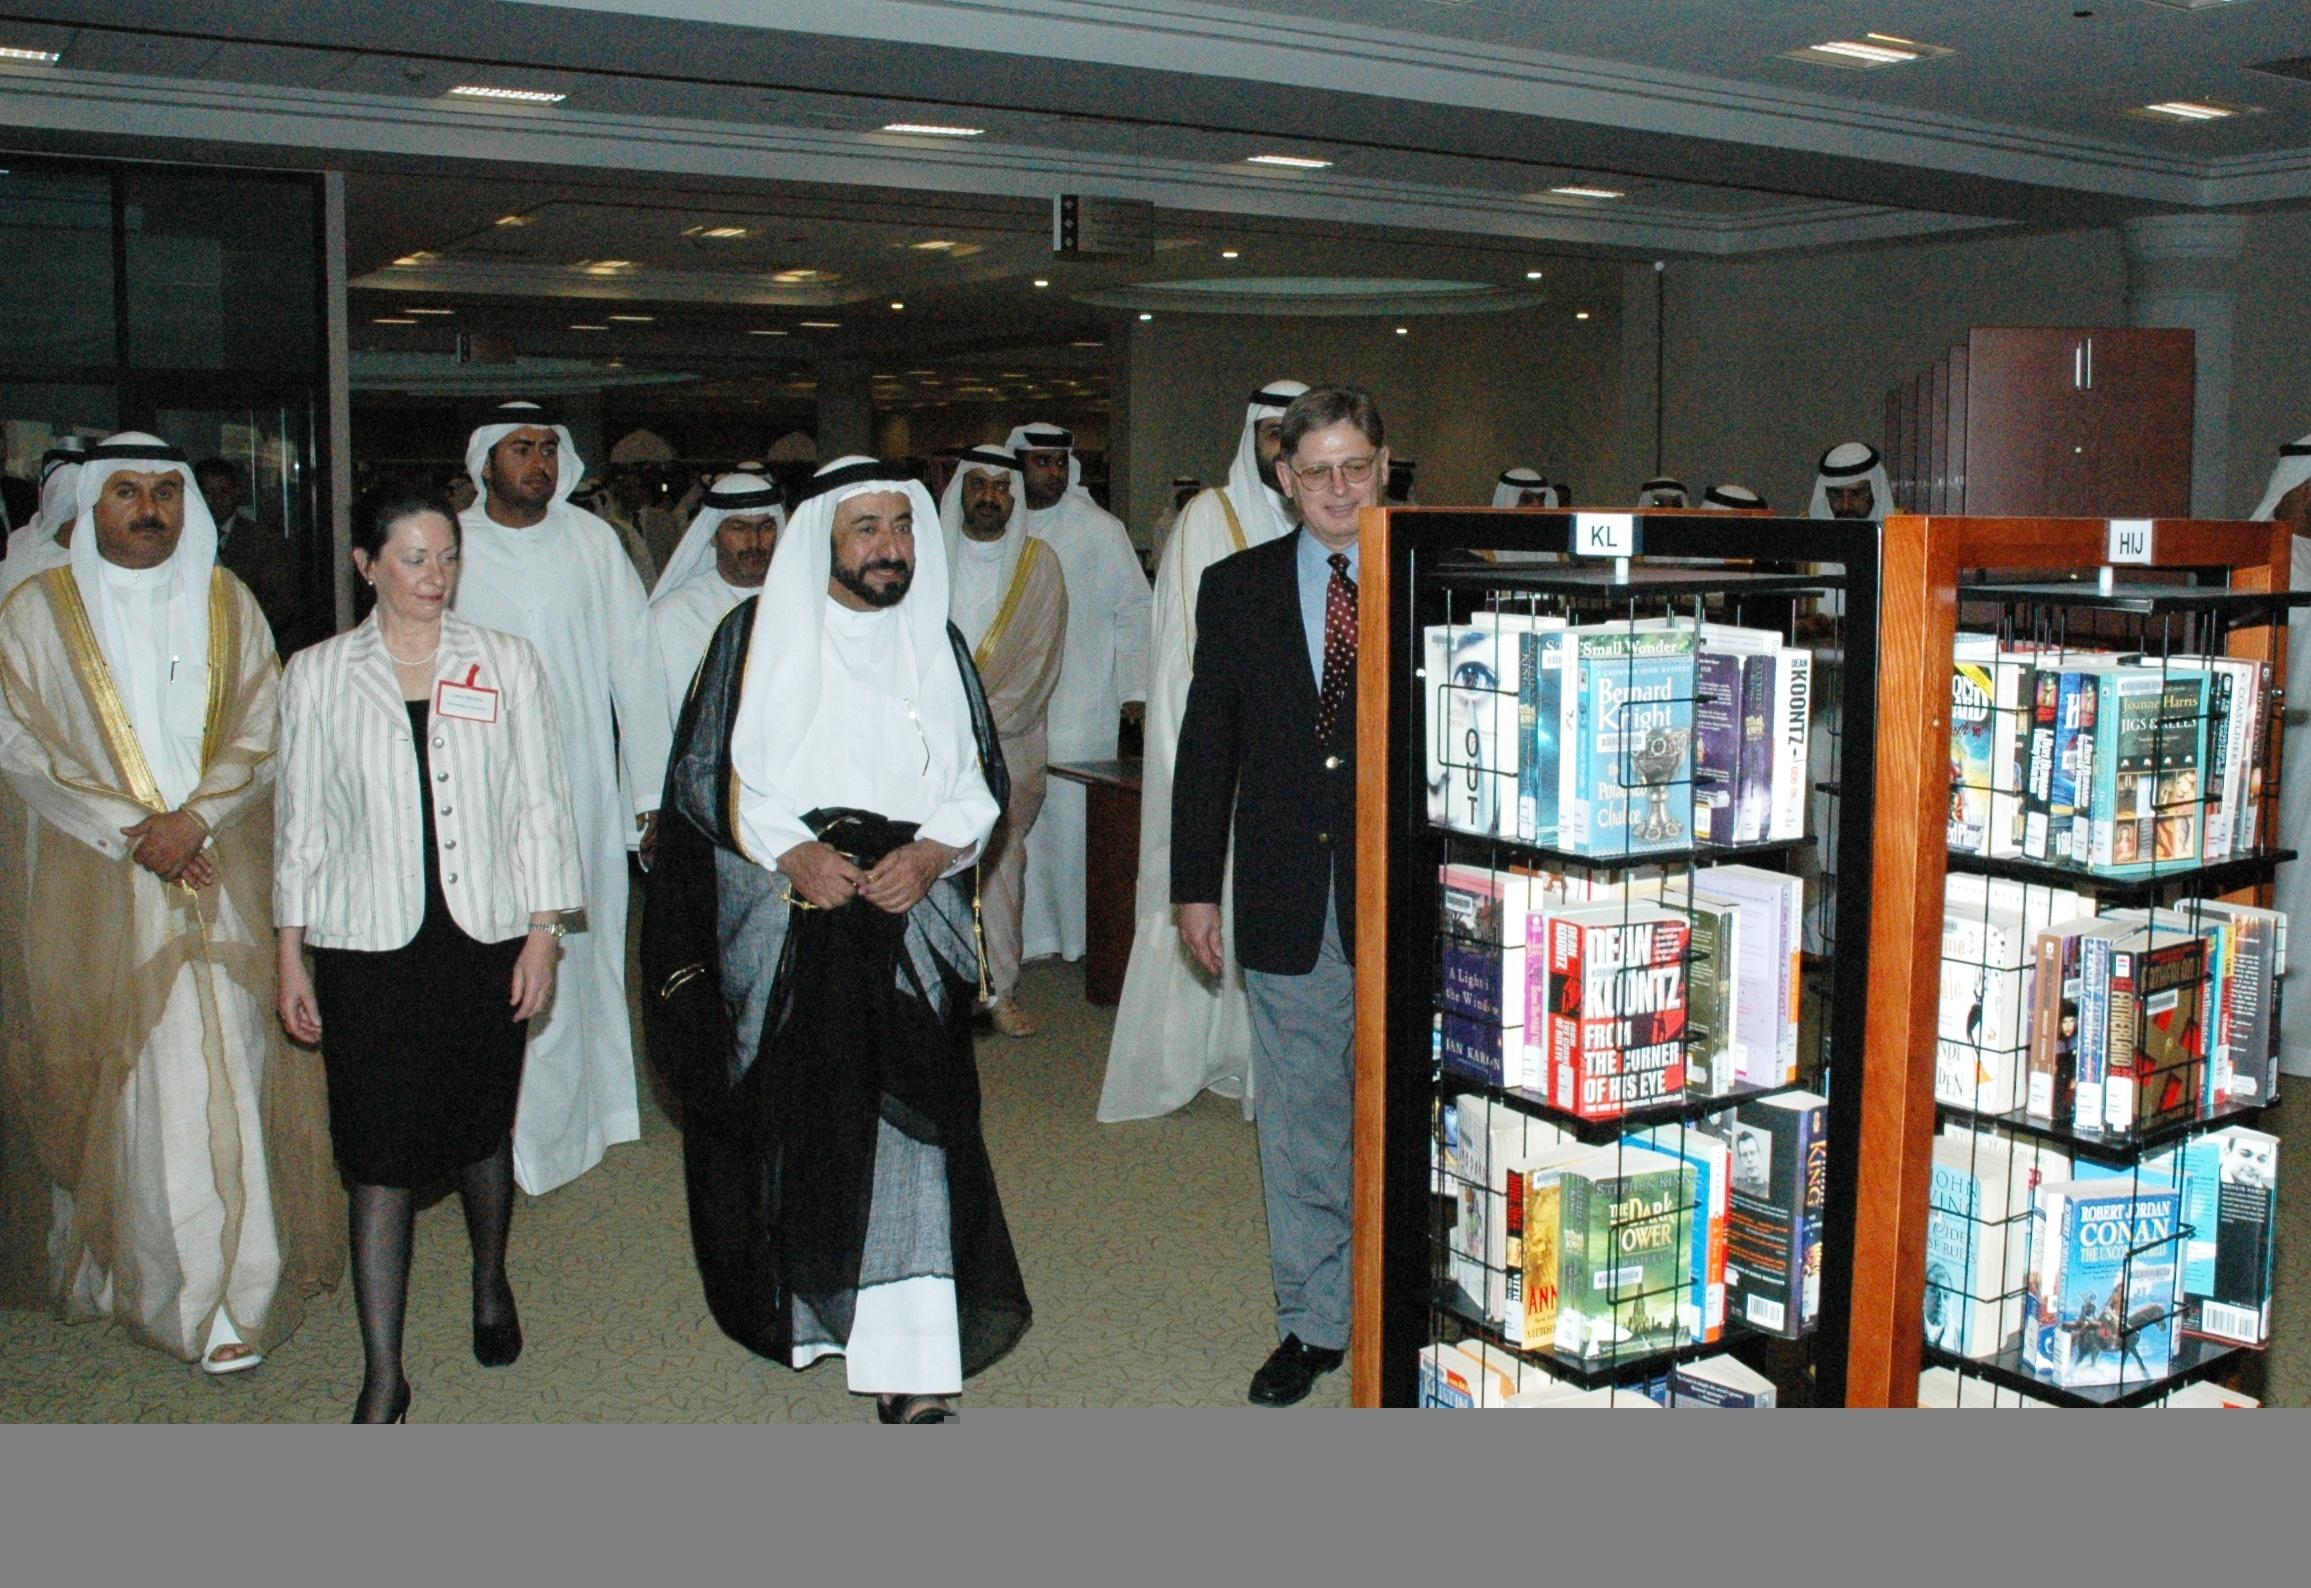 American_University_of_Sharjah_Library_10.jpg